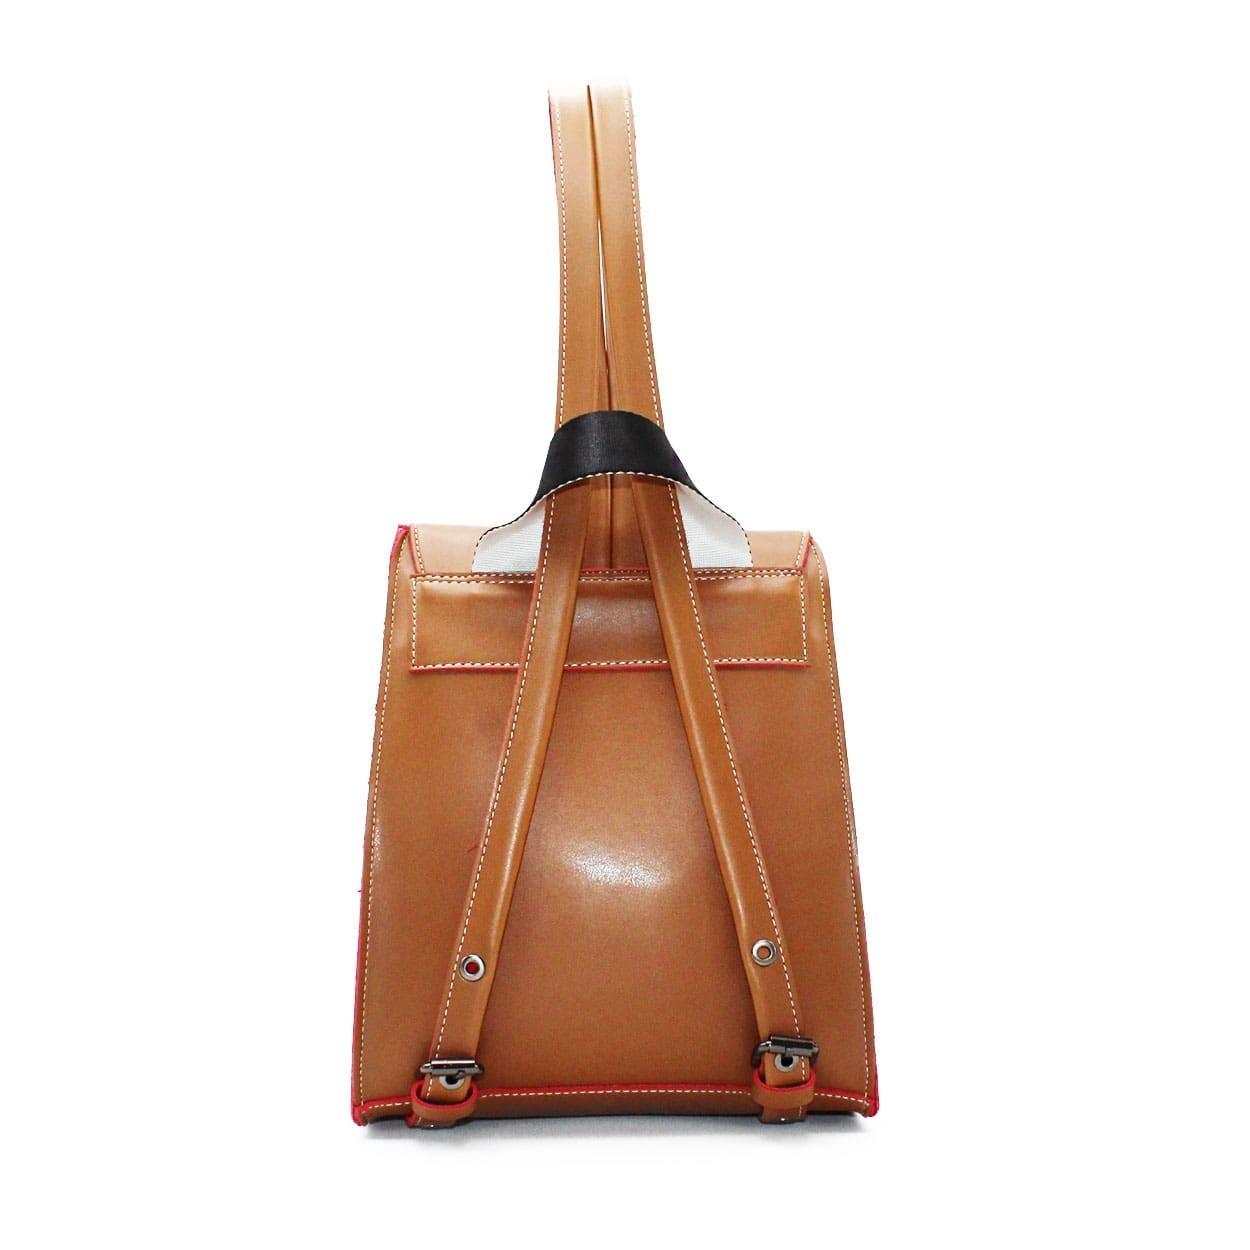 d7d864b4c6 FRNC FRANCESCO Τσάντα Γυναικεία Πλάτης-Backpack 1025 Ταμπά – IShoeStore